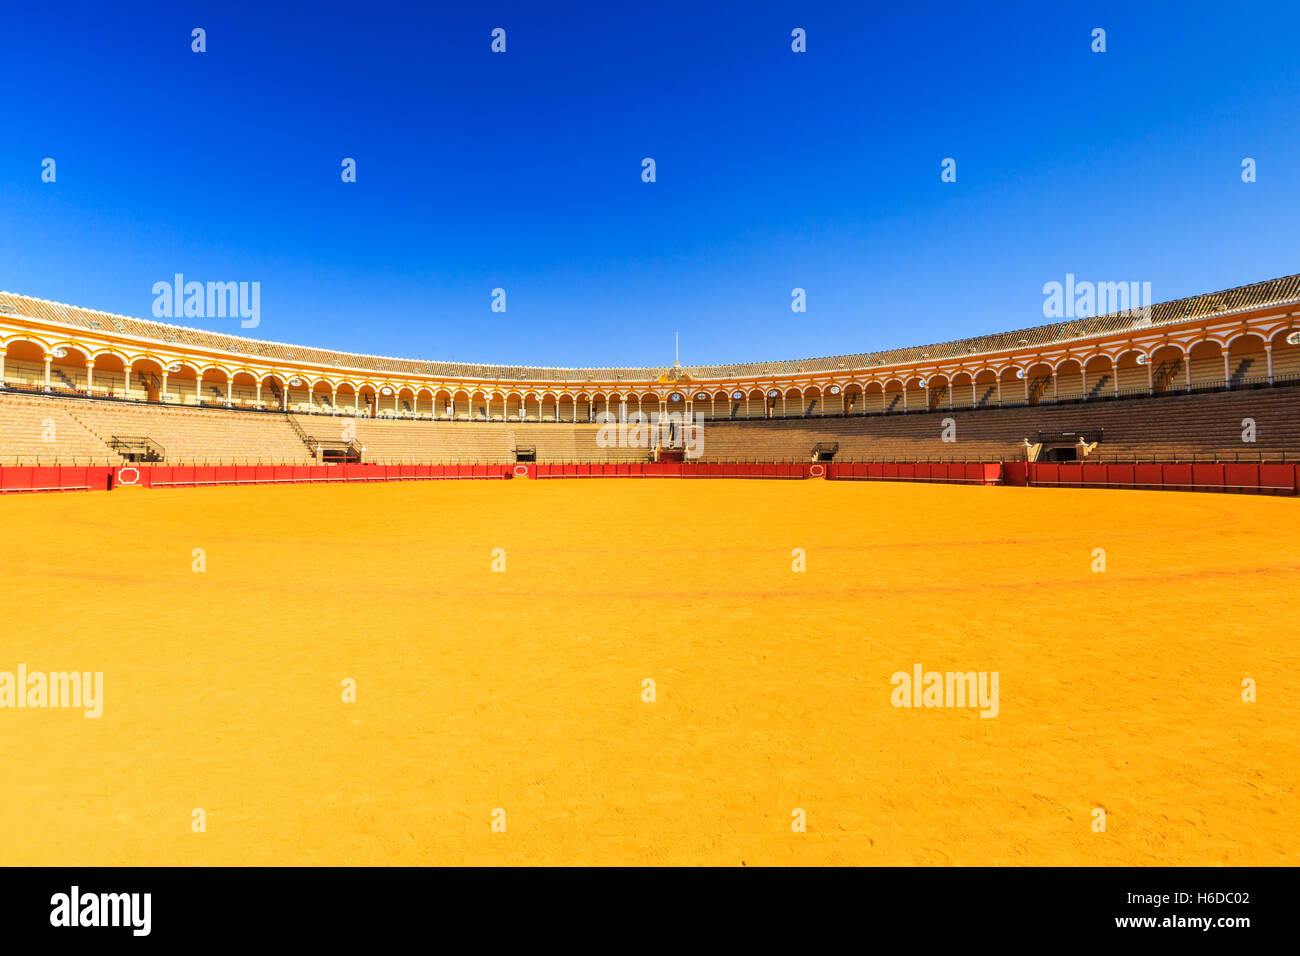 Sevilla, Spanien. Plaza de Toros (Stierkampfarena). Stockbild